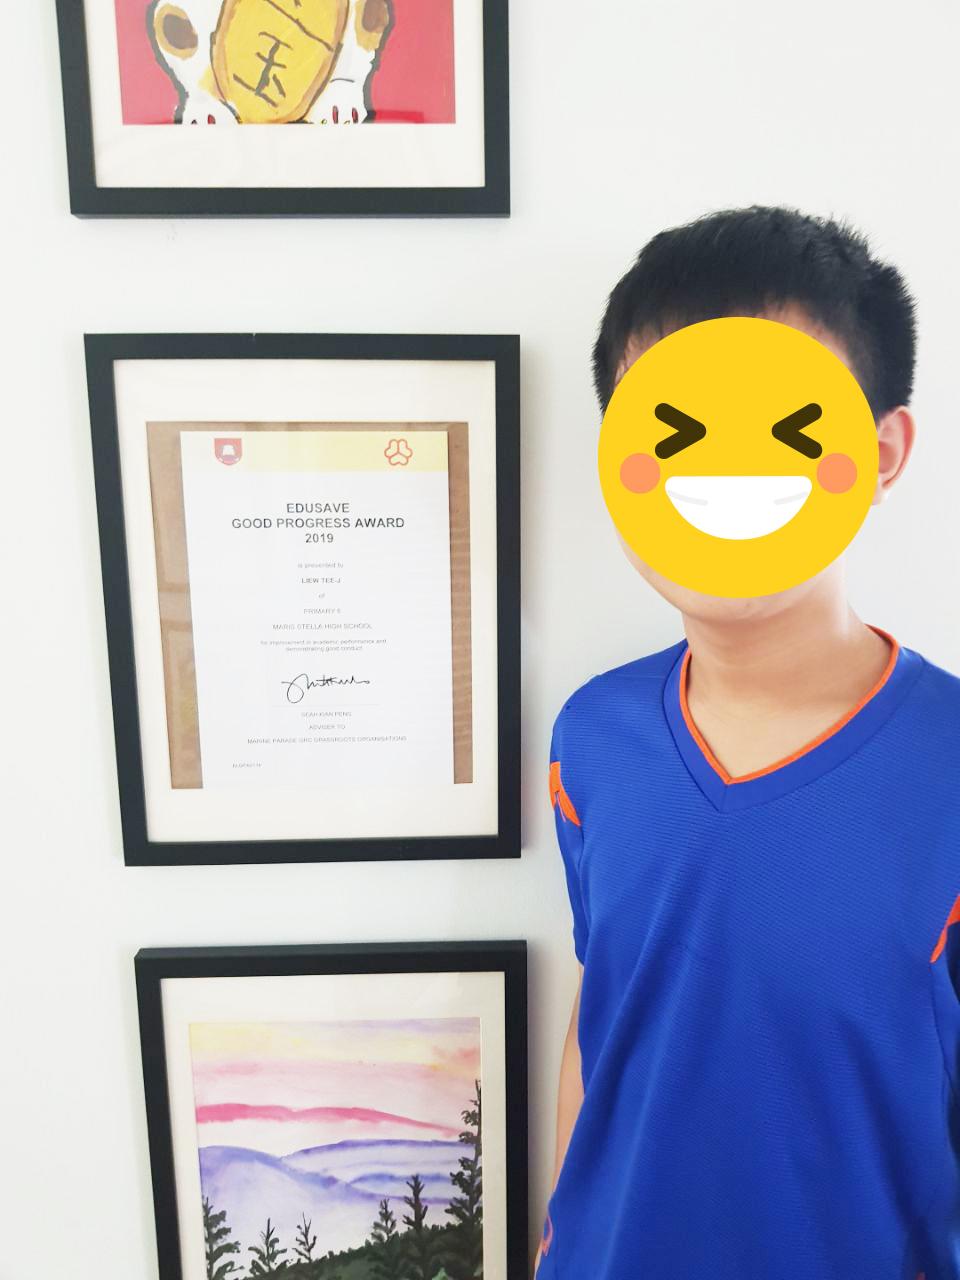 Student's Progress Award